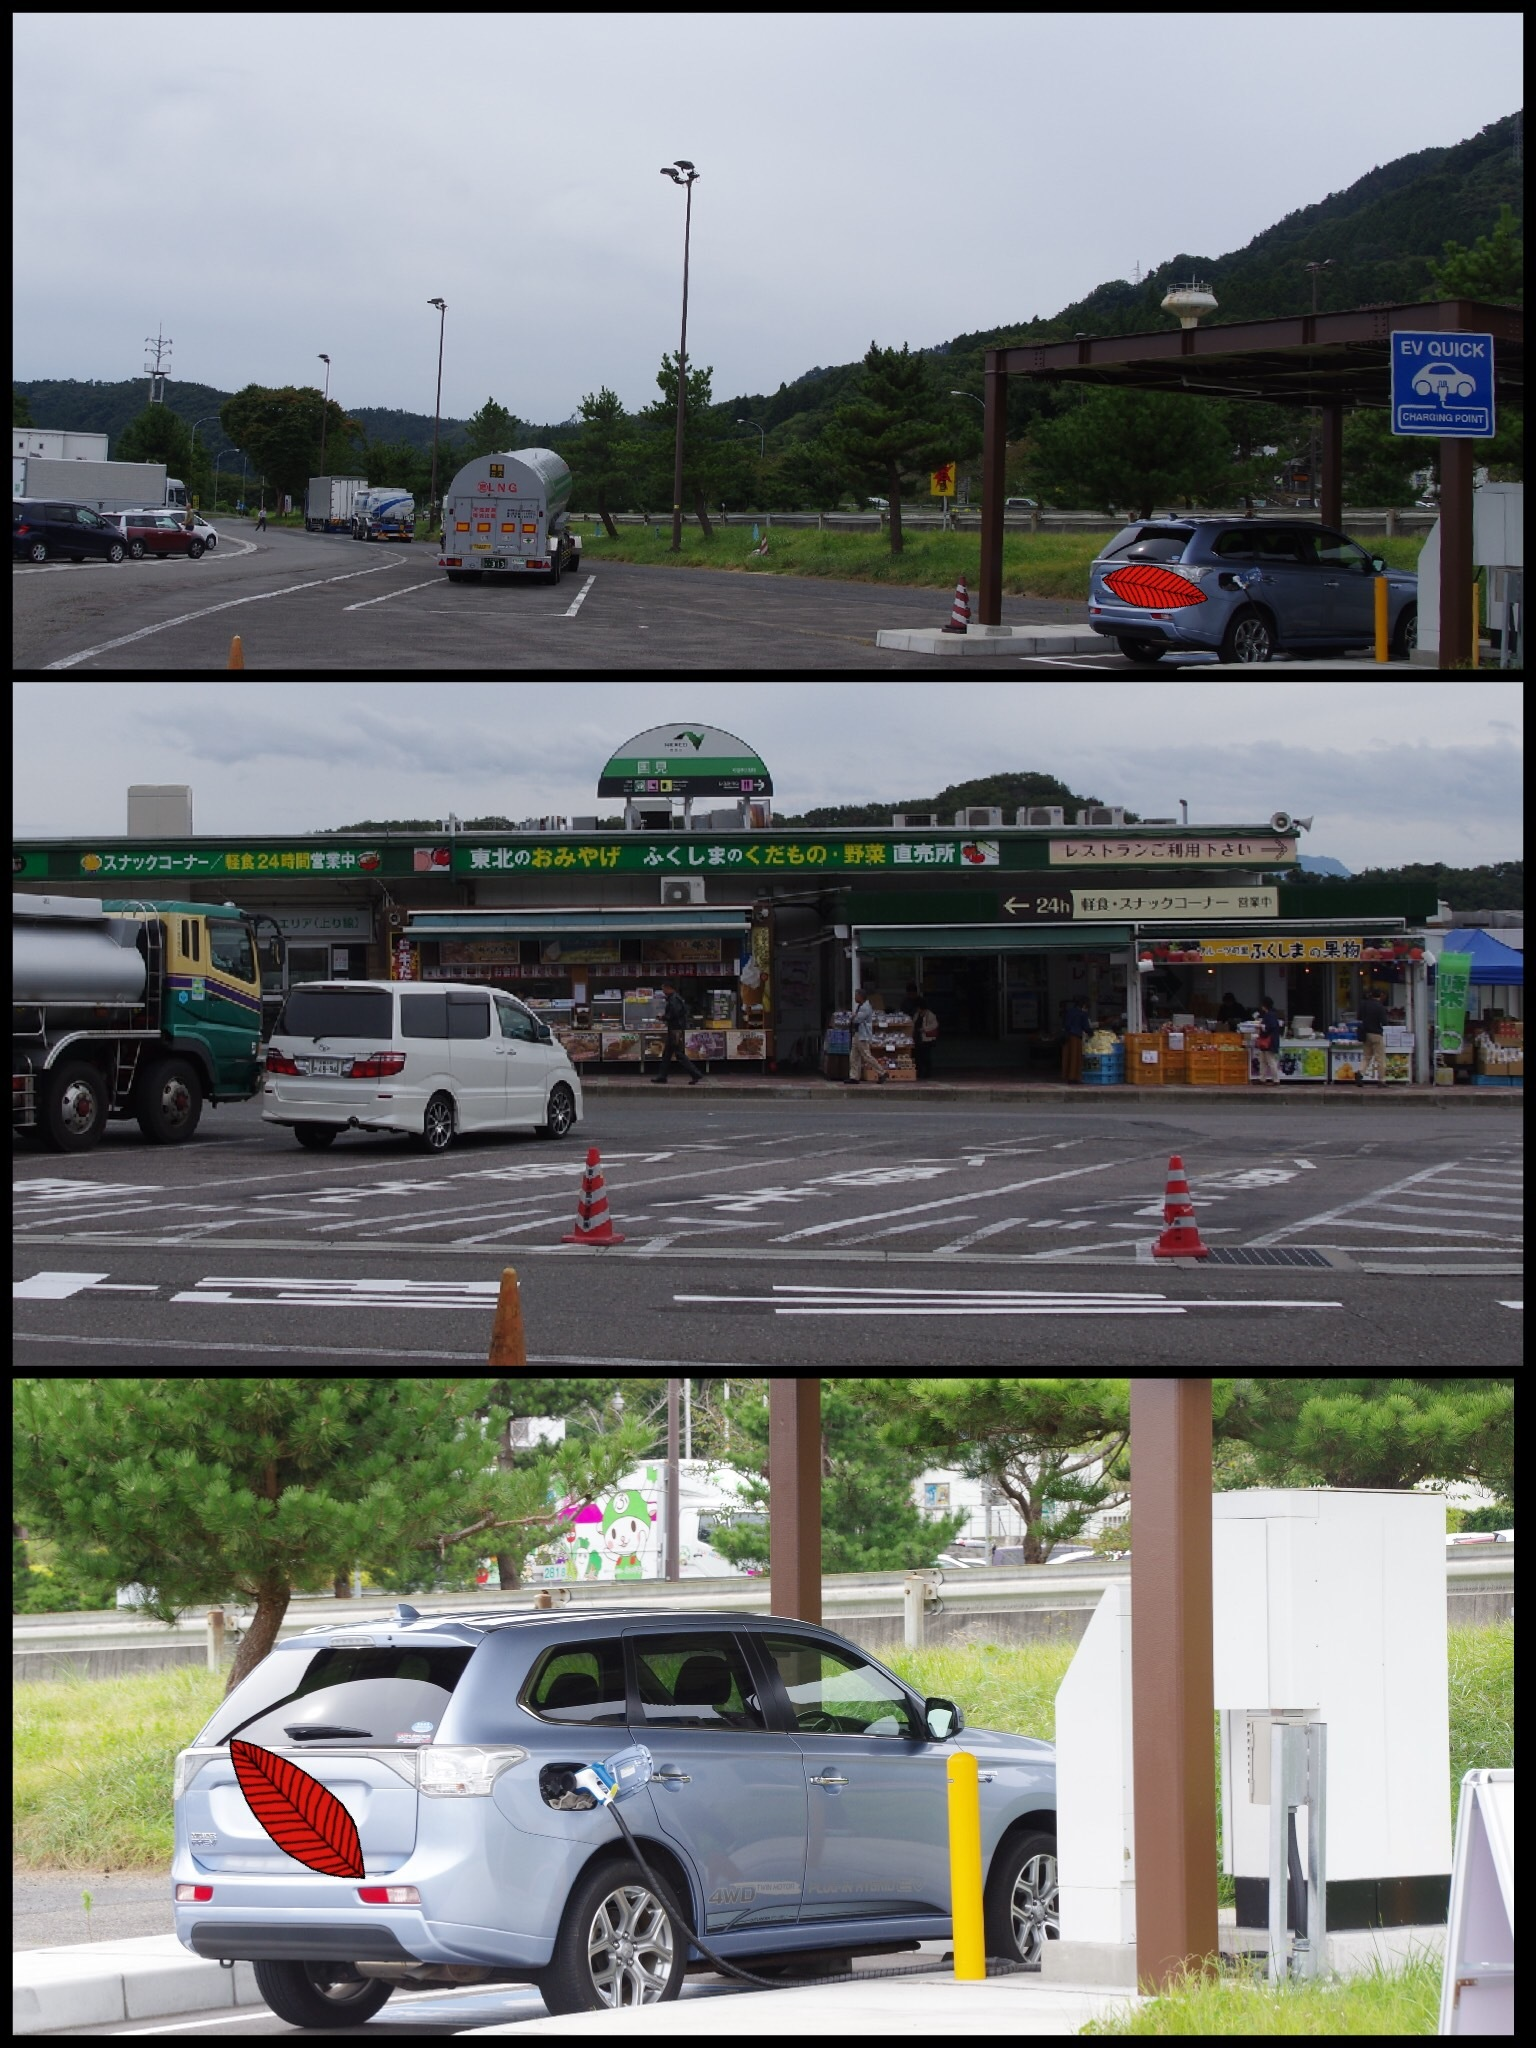 EV充電スポット 東北自動車道 国見sa 上り